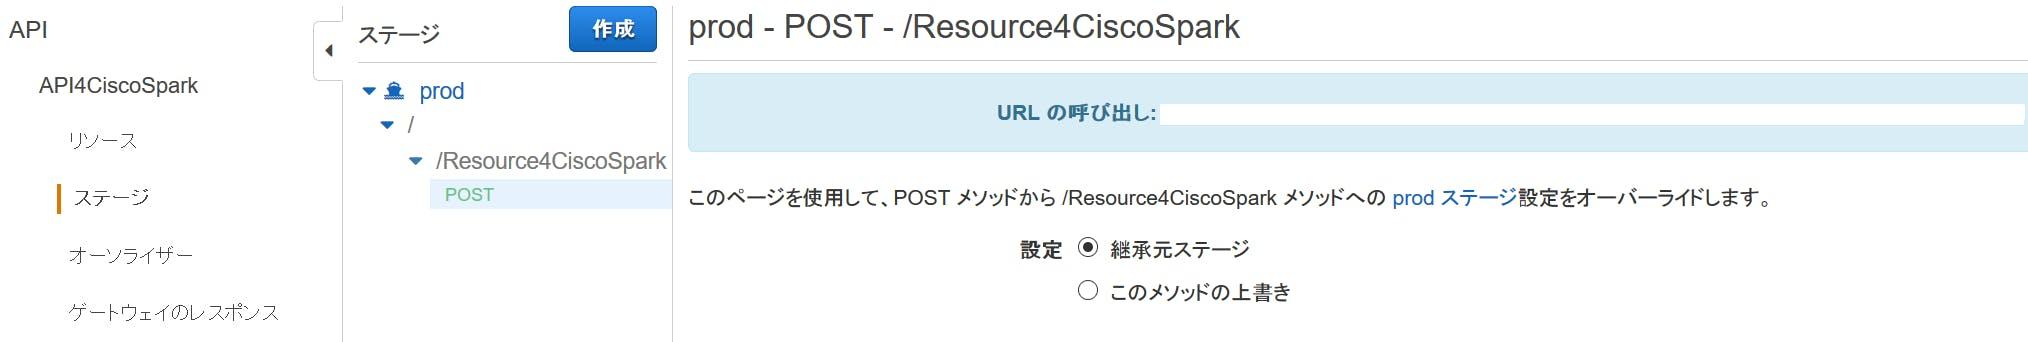 API_Gateway_step6.png